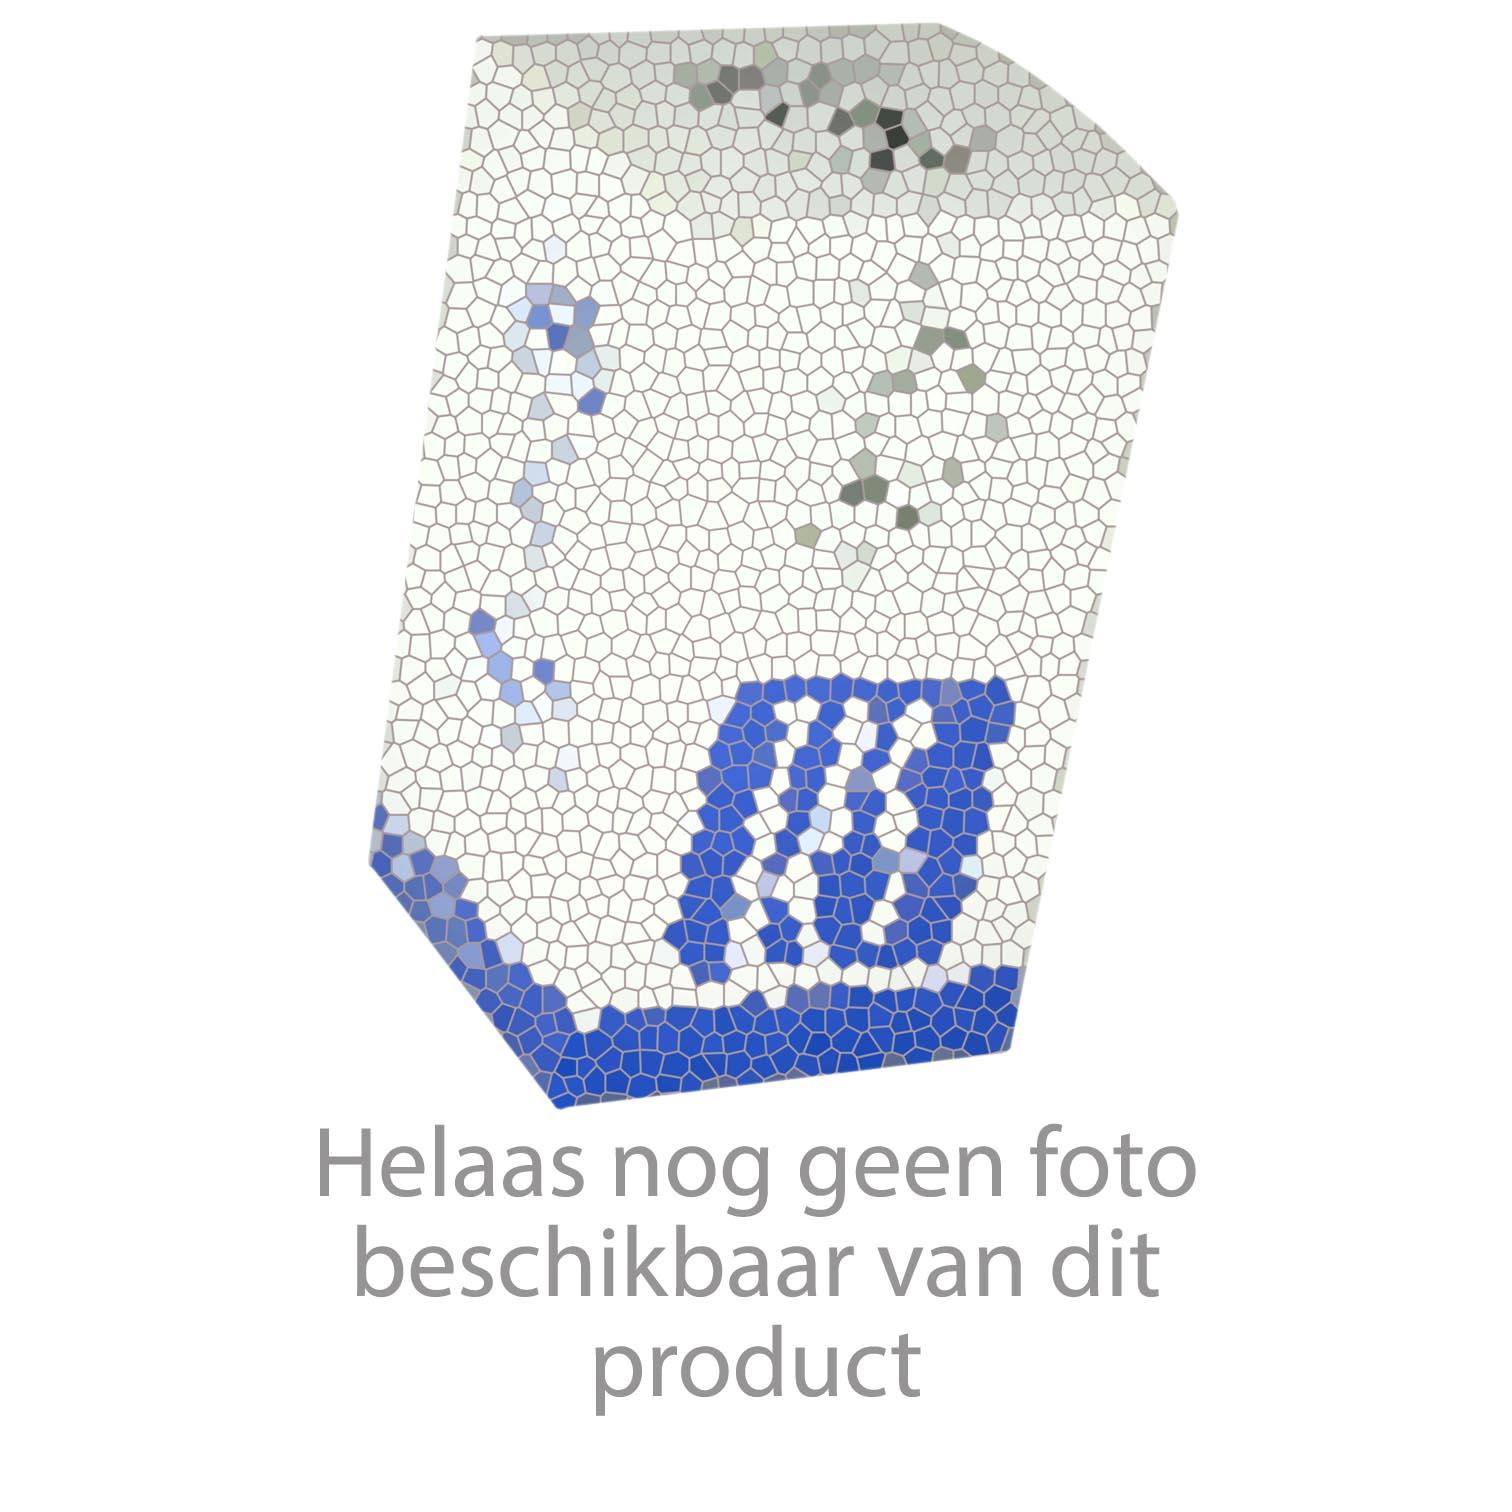 Hansa greep Hansaronda-style Chroom / transparant 43900003 (vervallen)